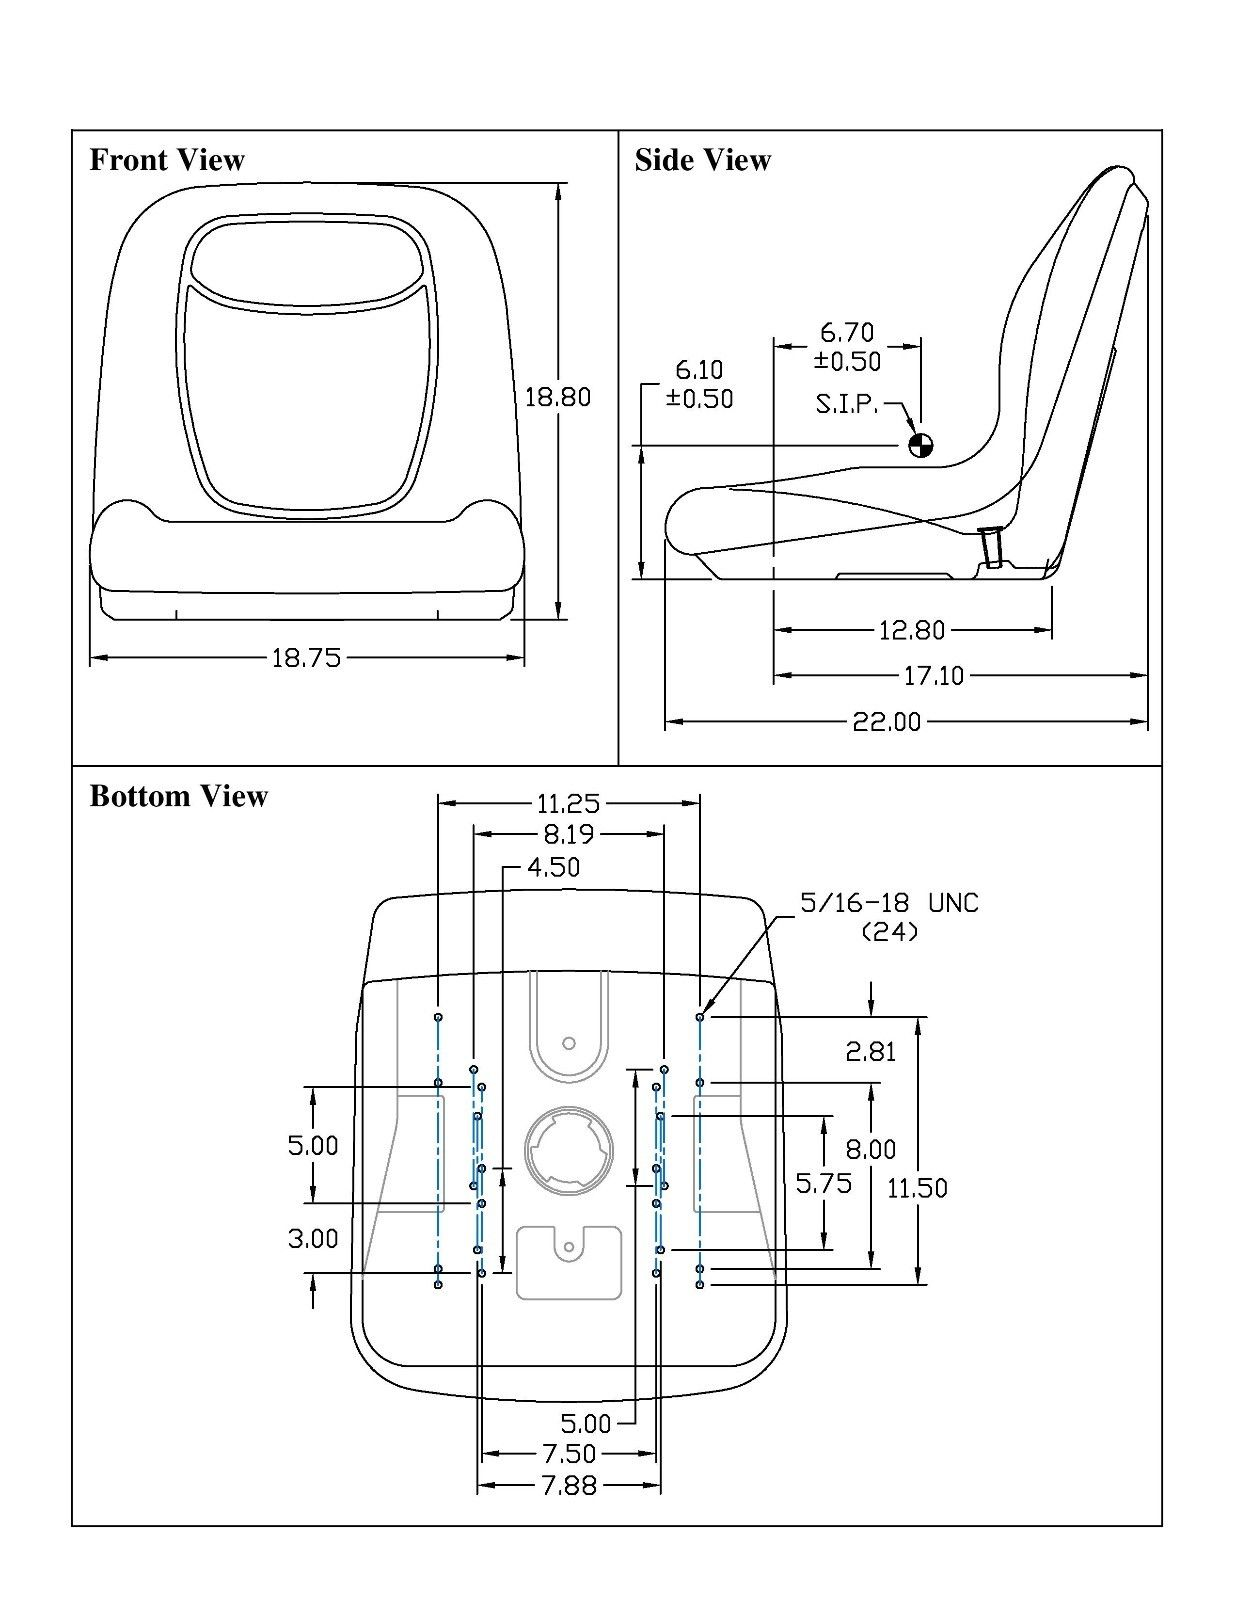 Grey High Back Seat For John Deere Gator Military 6x4 Mgator A1. Grey High Back Seat For John Deere Gator Military 6x4 Mgator A1 Utility Utv. John Deere. Miliatary John Deere Gator 6x4 Parts Diagram At Scoala.co